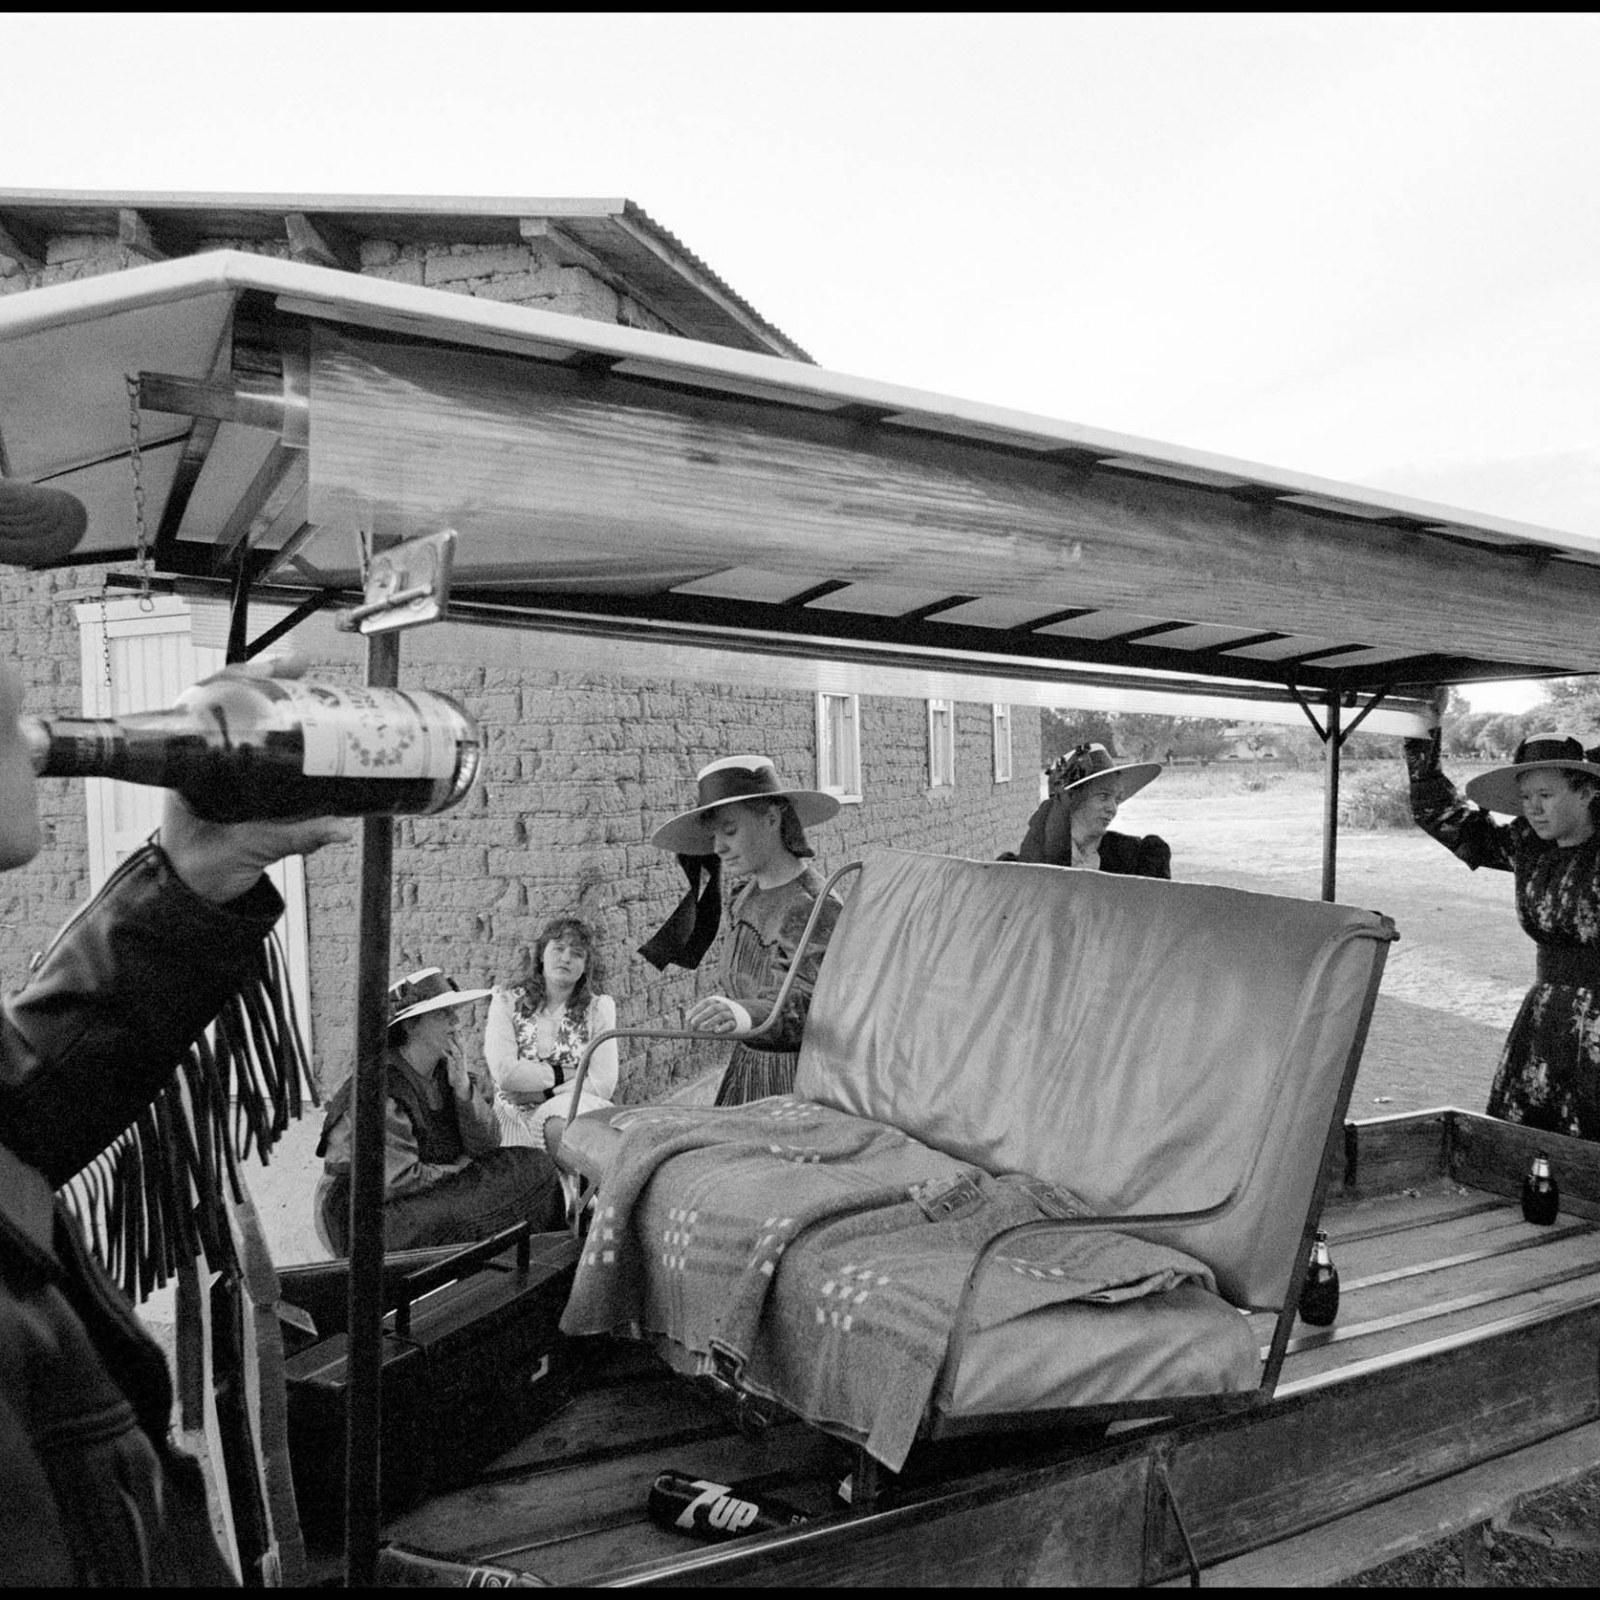 Fifty Shades of Amish: A Strange Genre of the Romance Novel